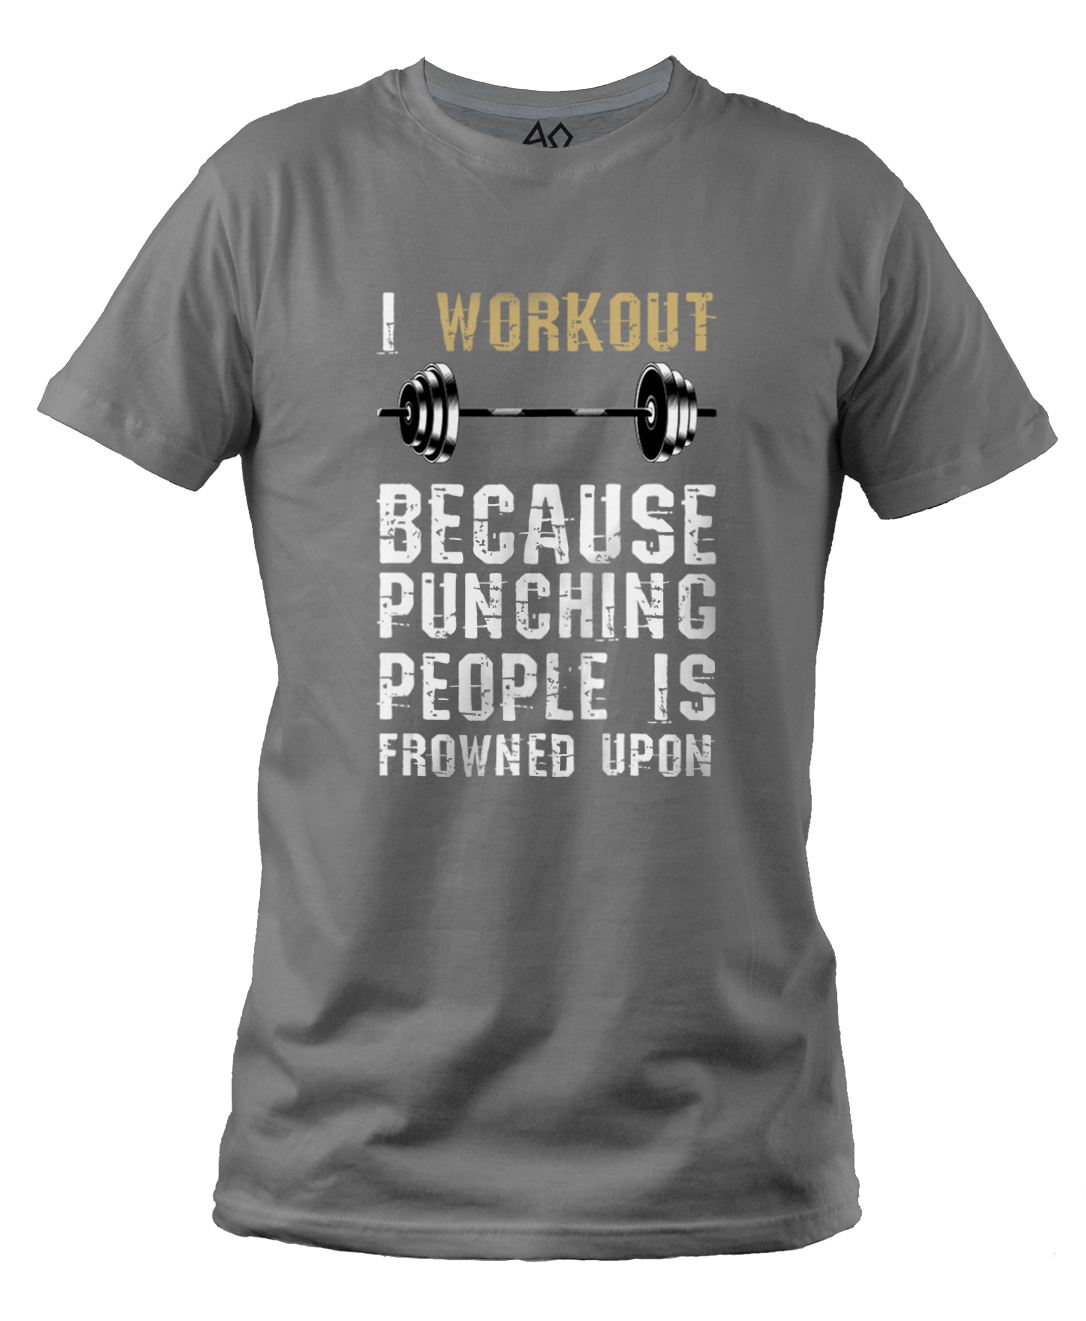 ed8005a3477 Workout – Romfeas – Εκτύπωσεις / Μεταξοτυπίες